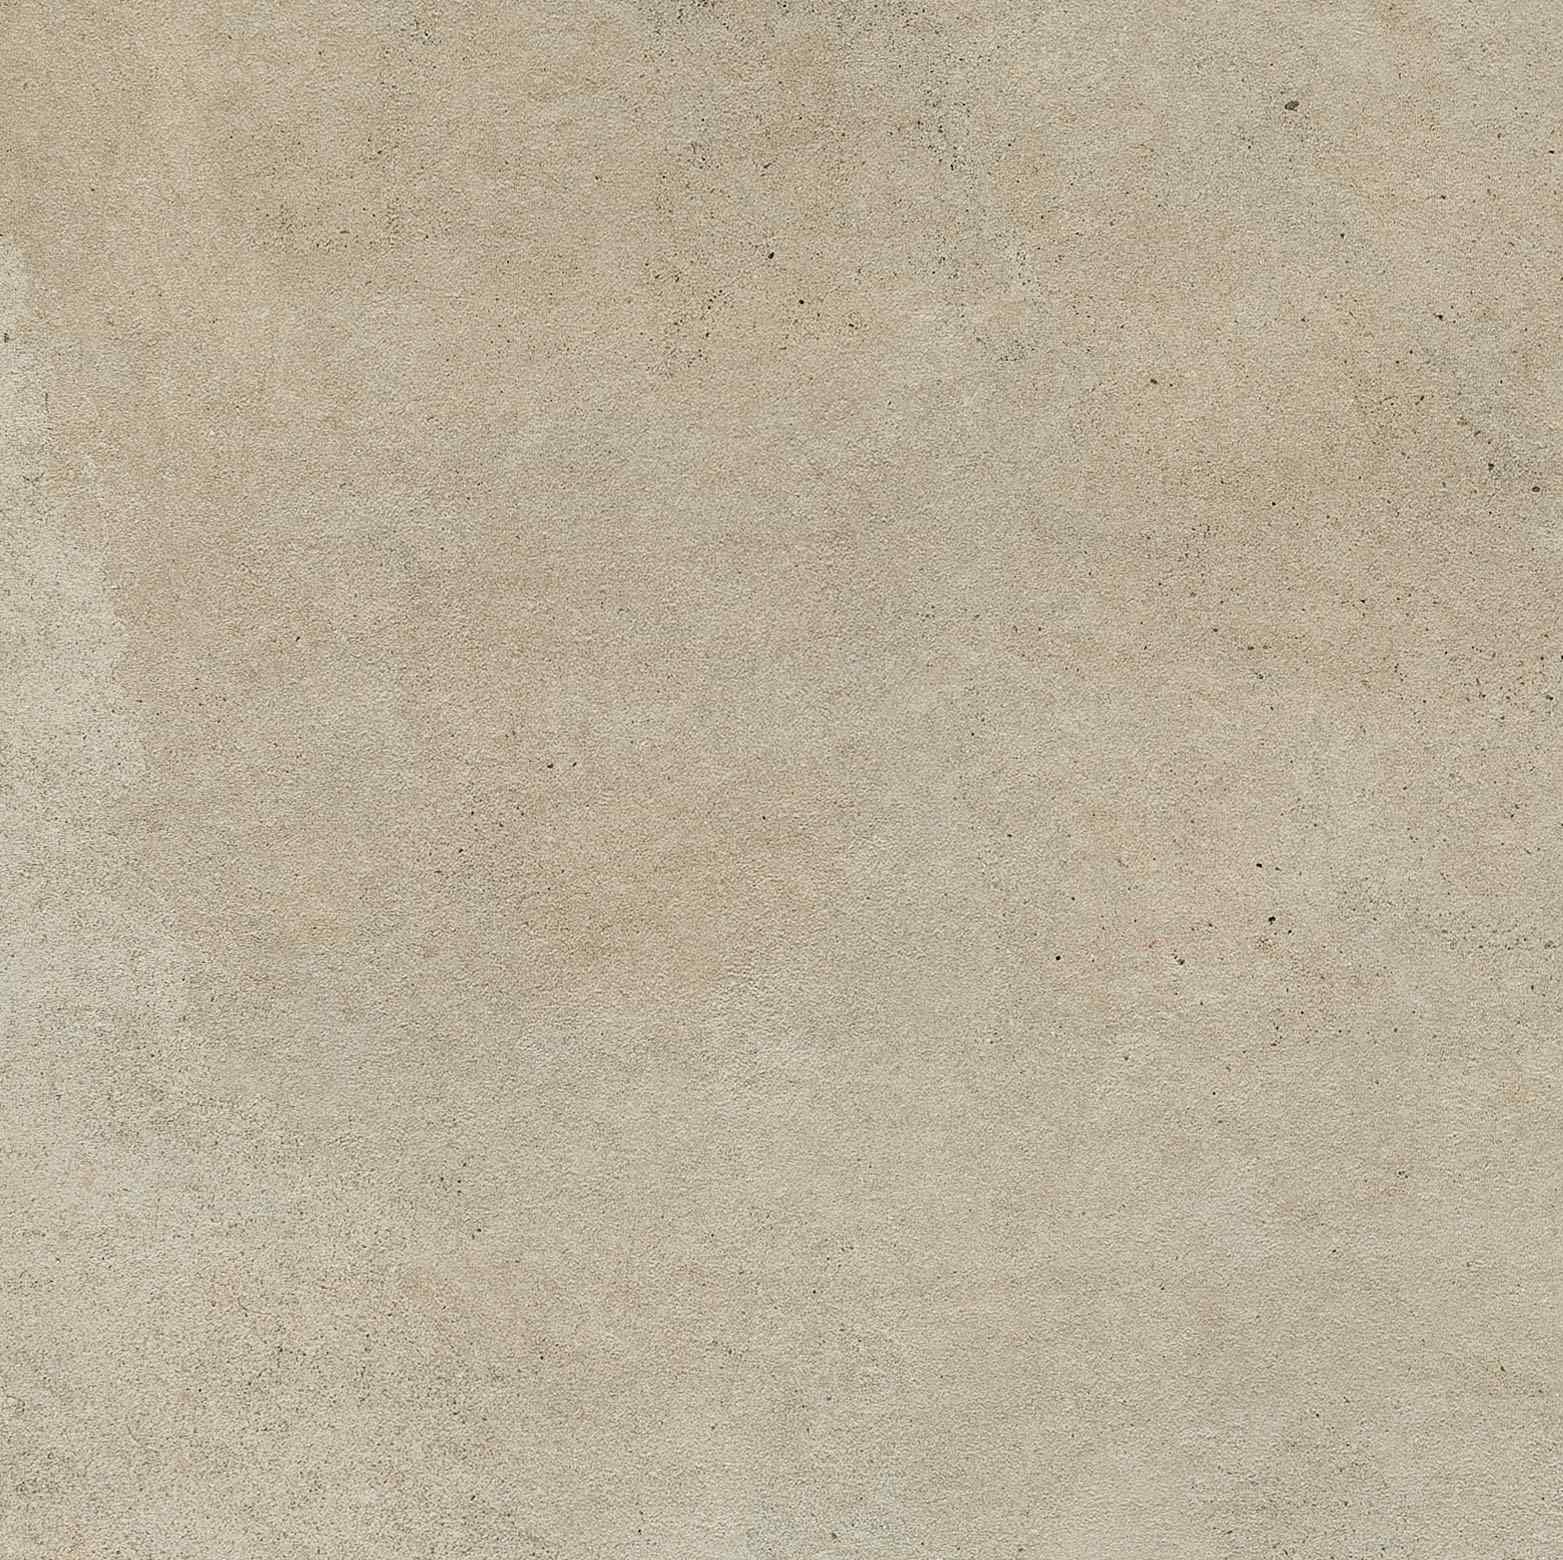 Pietre/3 Limestone Taupe Matte 10mm 80 x 80